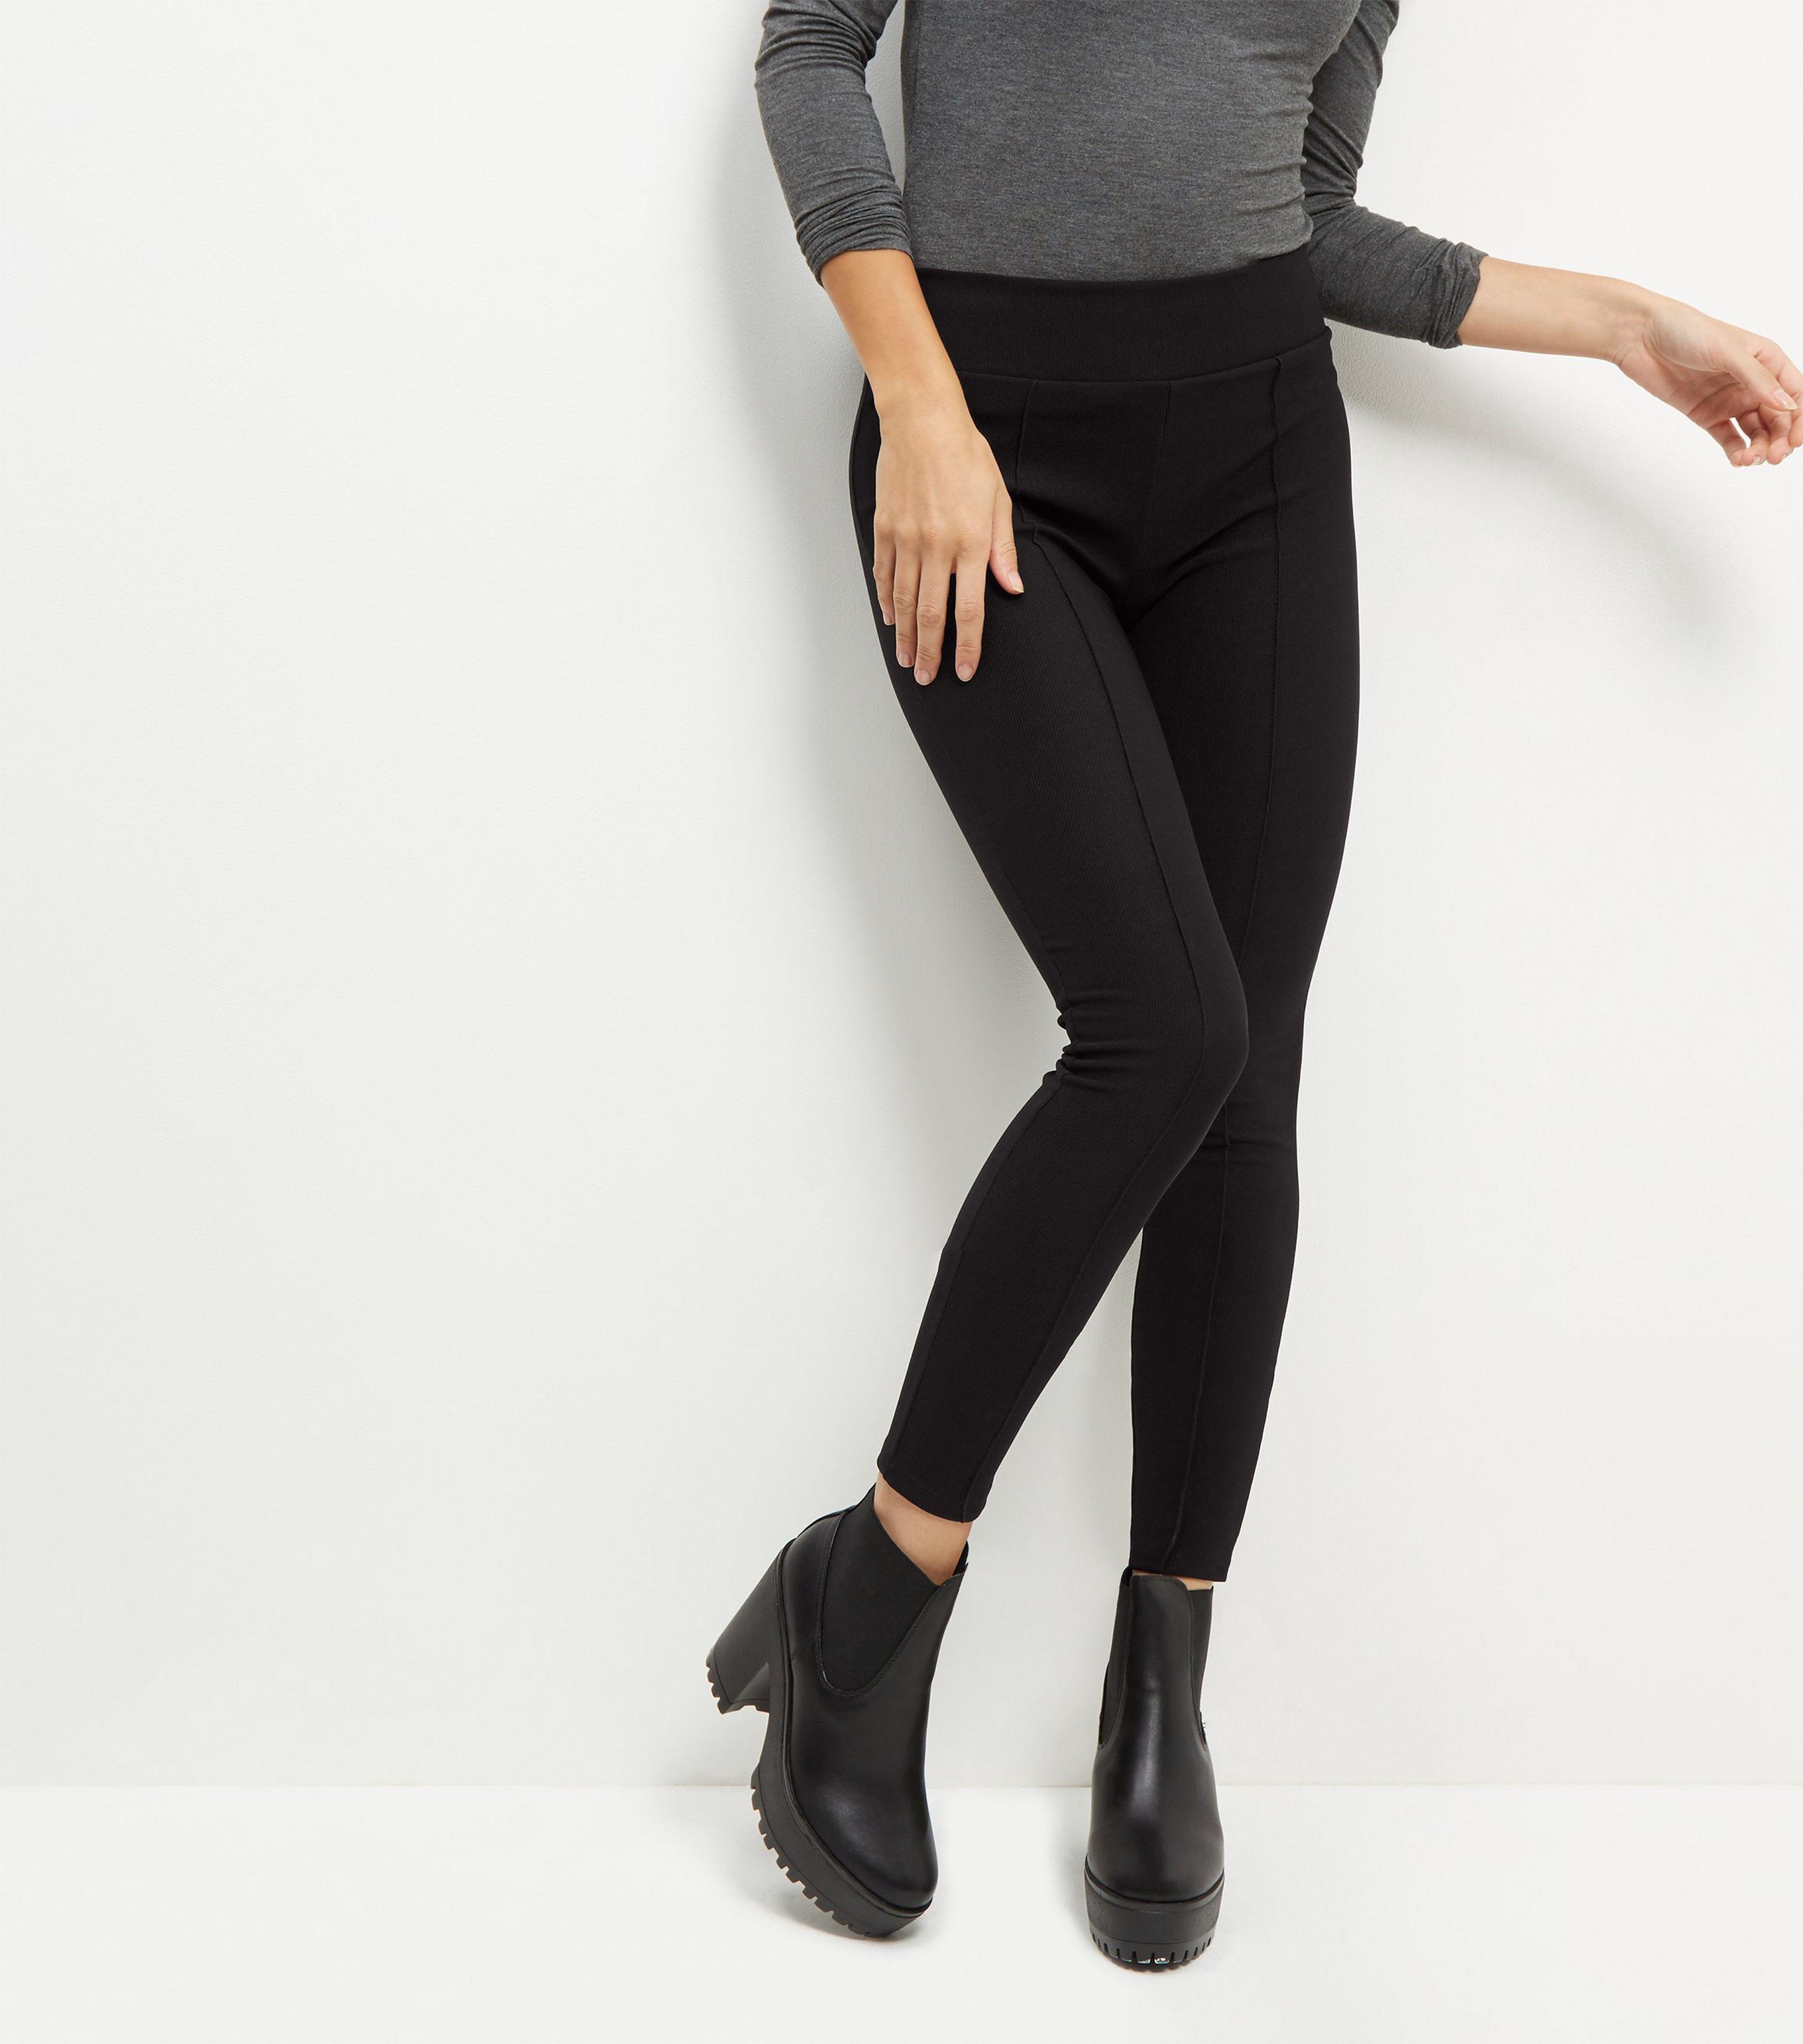 3bef0443c483cc New Look Black Ribbed Seam Front Leggings in Black - Lyst